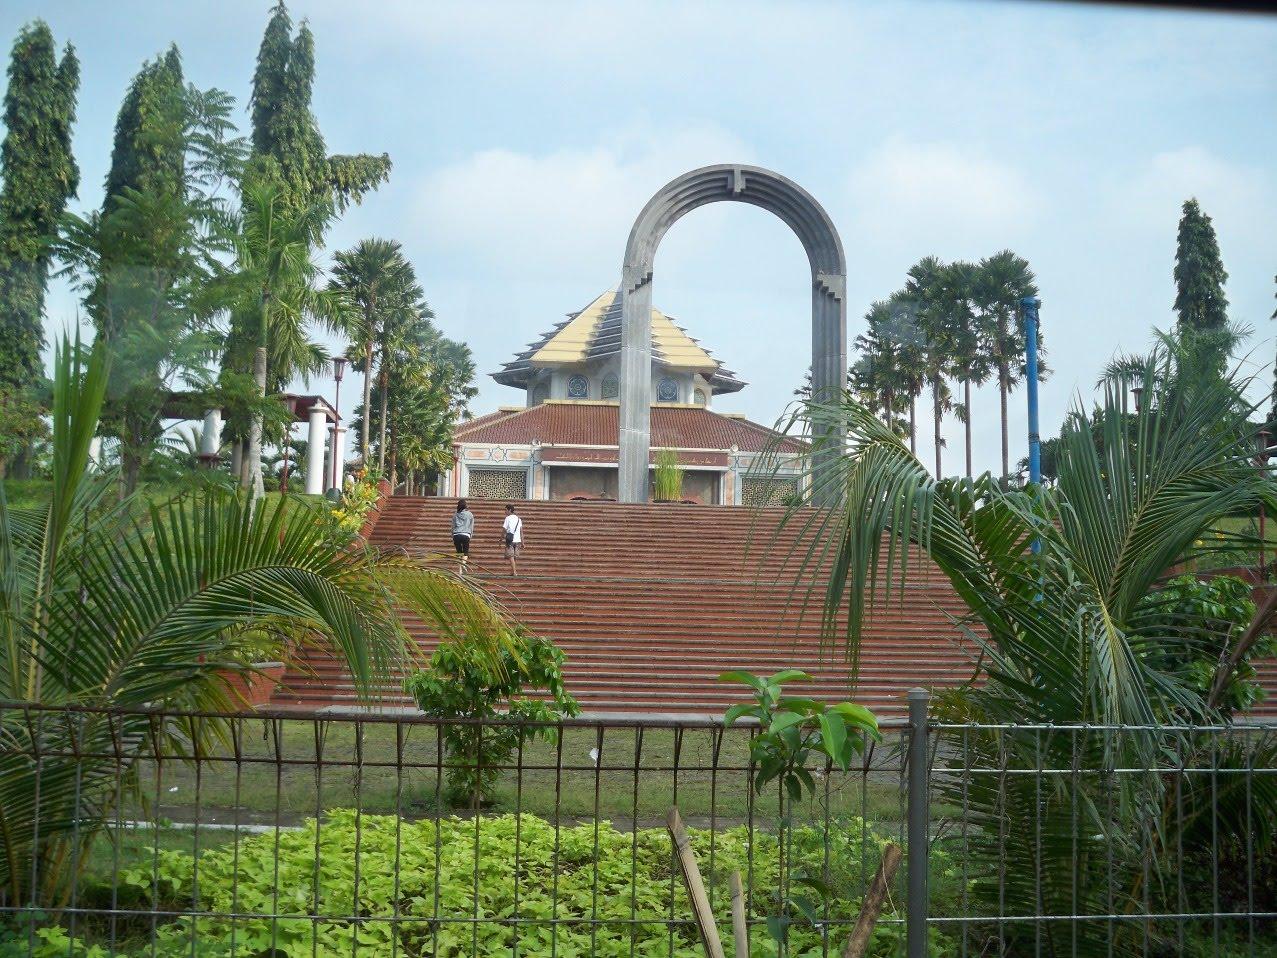 Masjid Kampus Ugm Wisata Yogyakarta Masji Maskam Kab Sleman